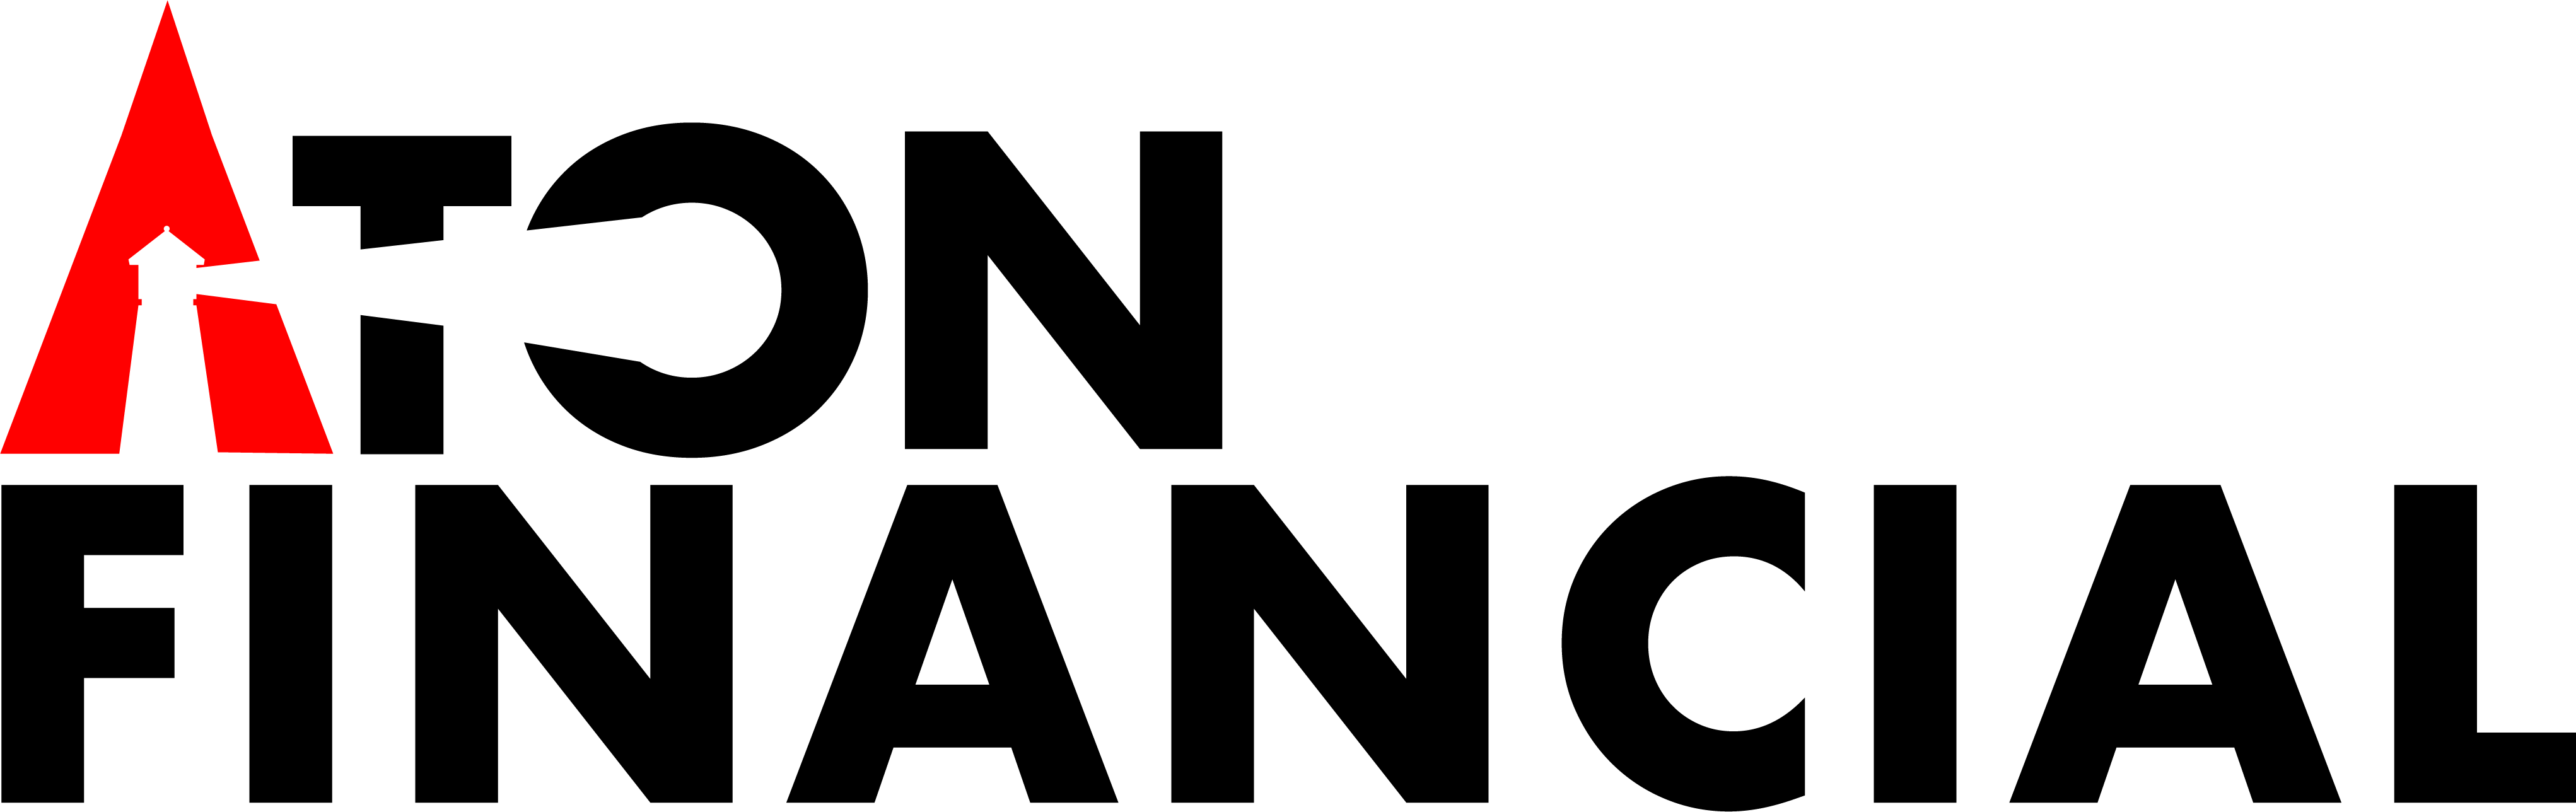 Logo for Registered Investment Advisory Firm - Fee-Based Financial Planning - Puerto Rico